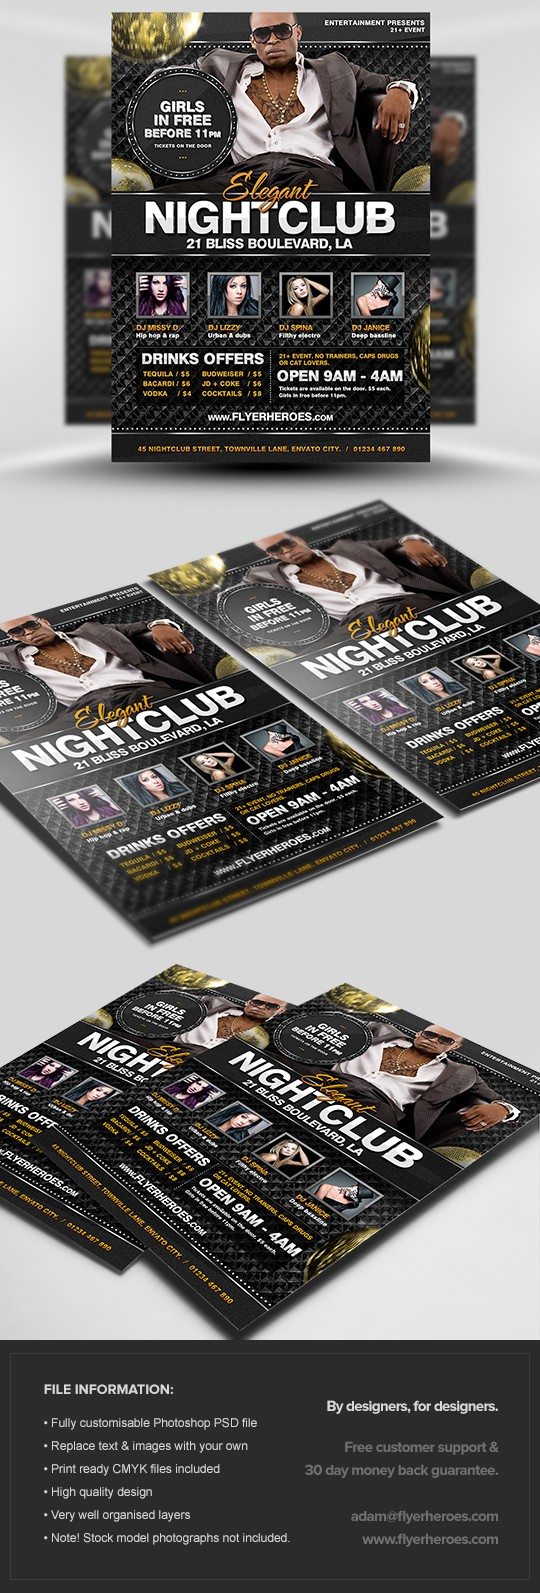 Elegant Nightclub Flyer Template